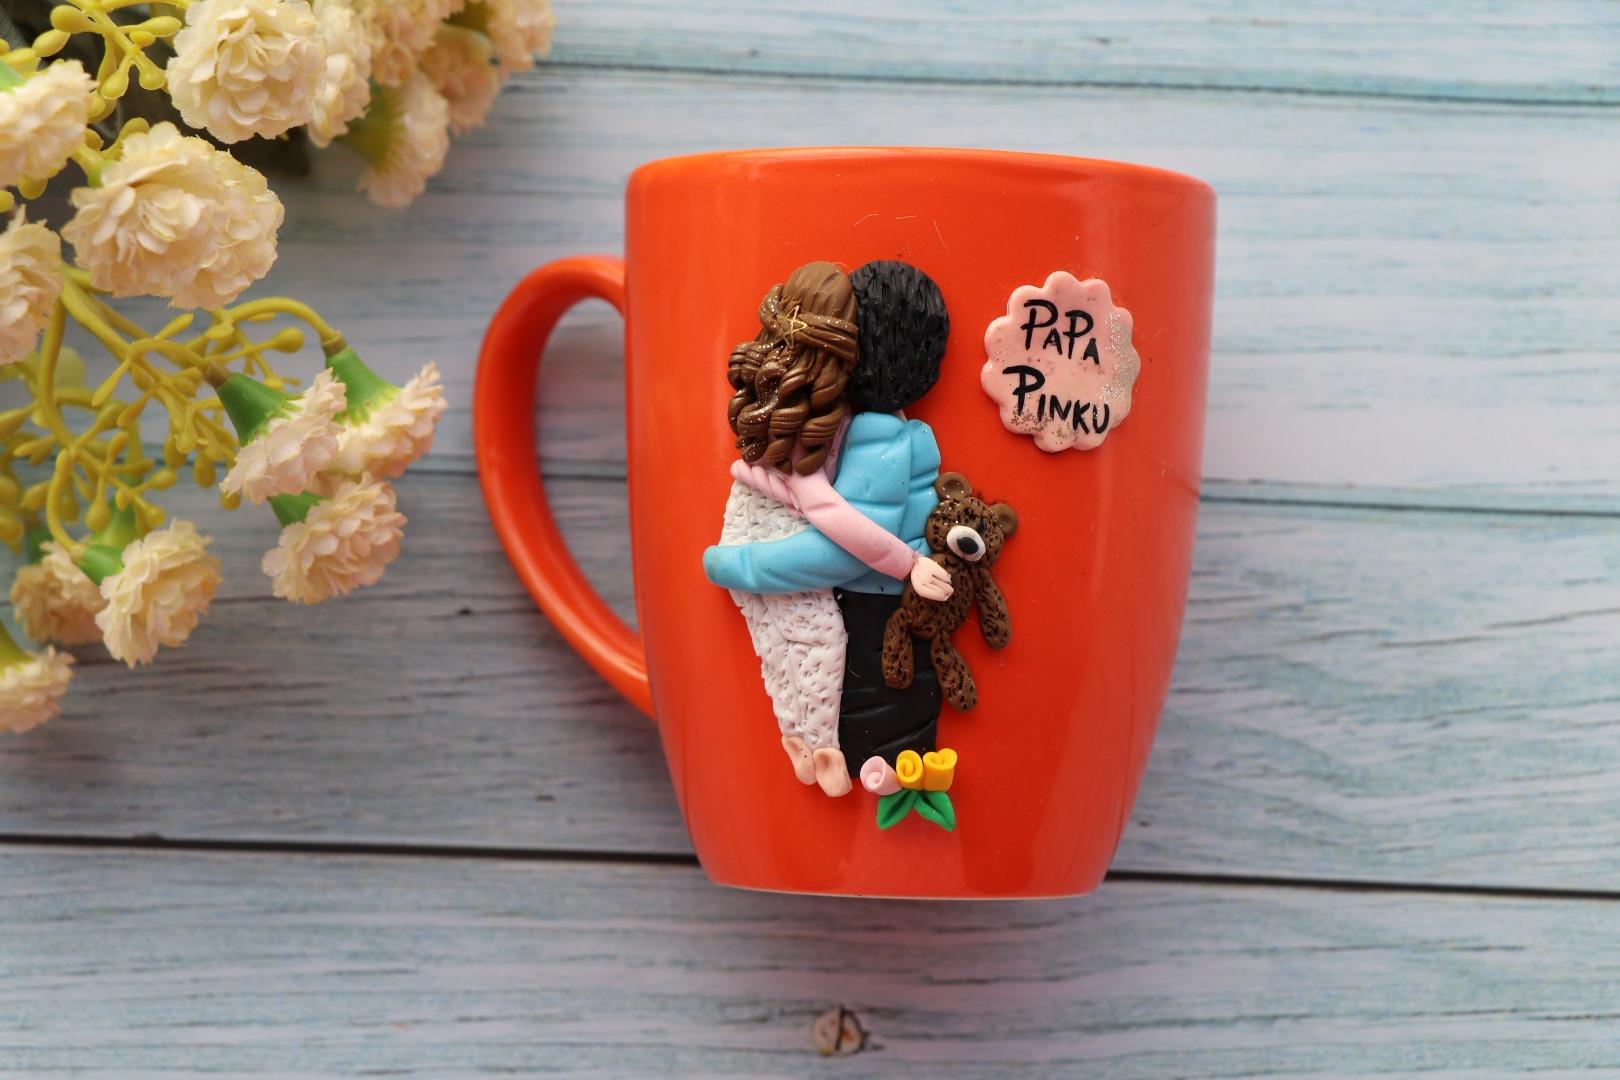 adorable coffee mug with cute caricature